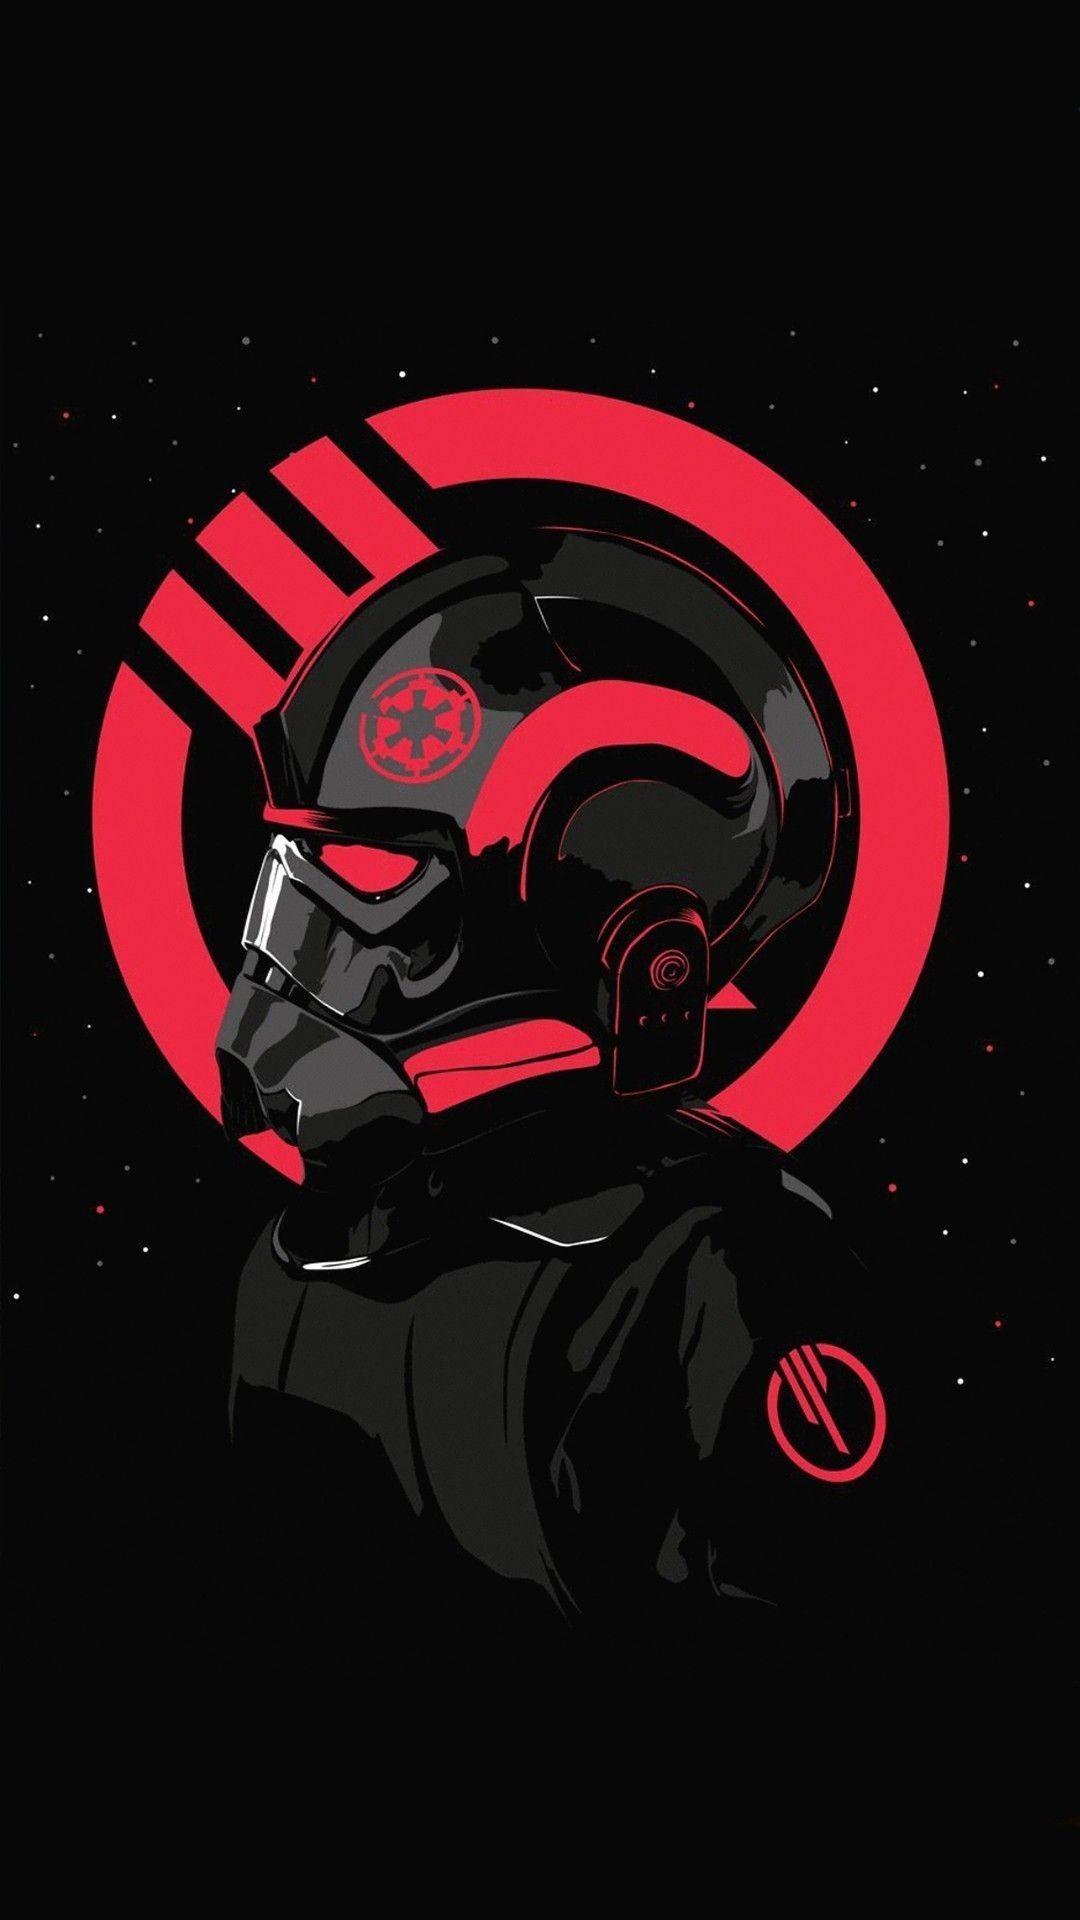 Tie Fighter Star Wars Poster Star Wars Pictures Star Wars Wallpaper